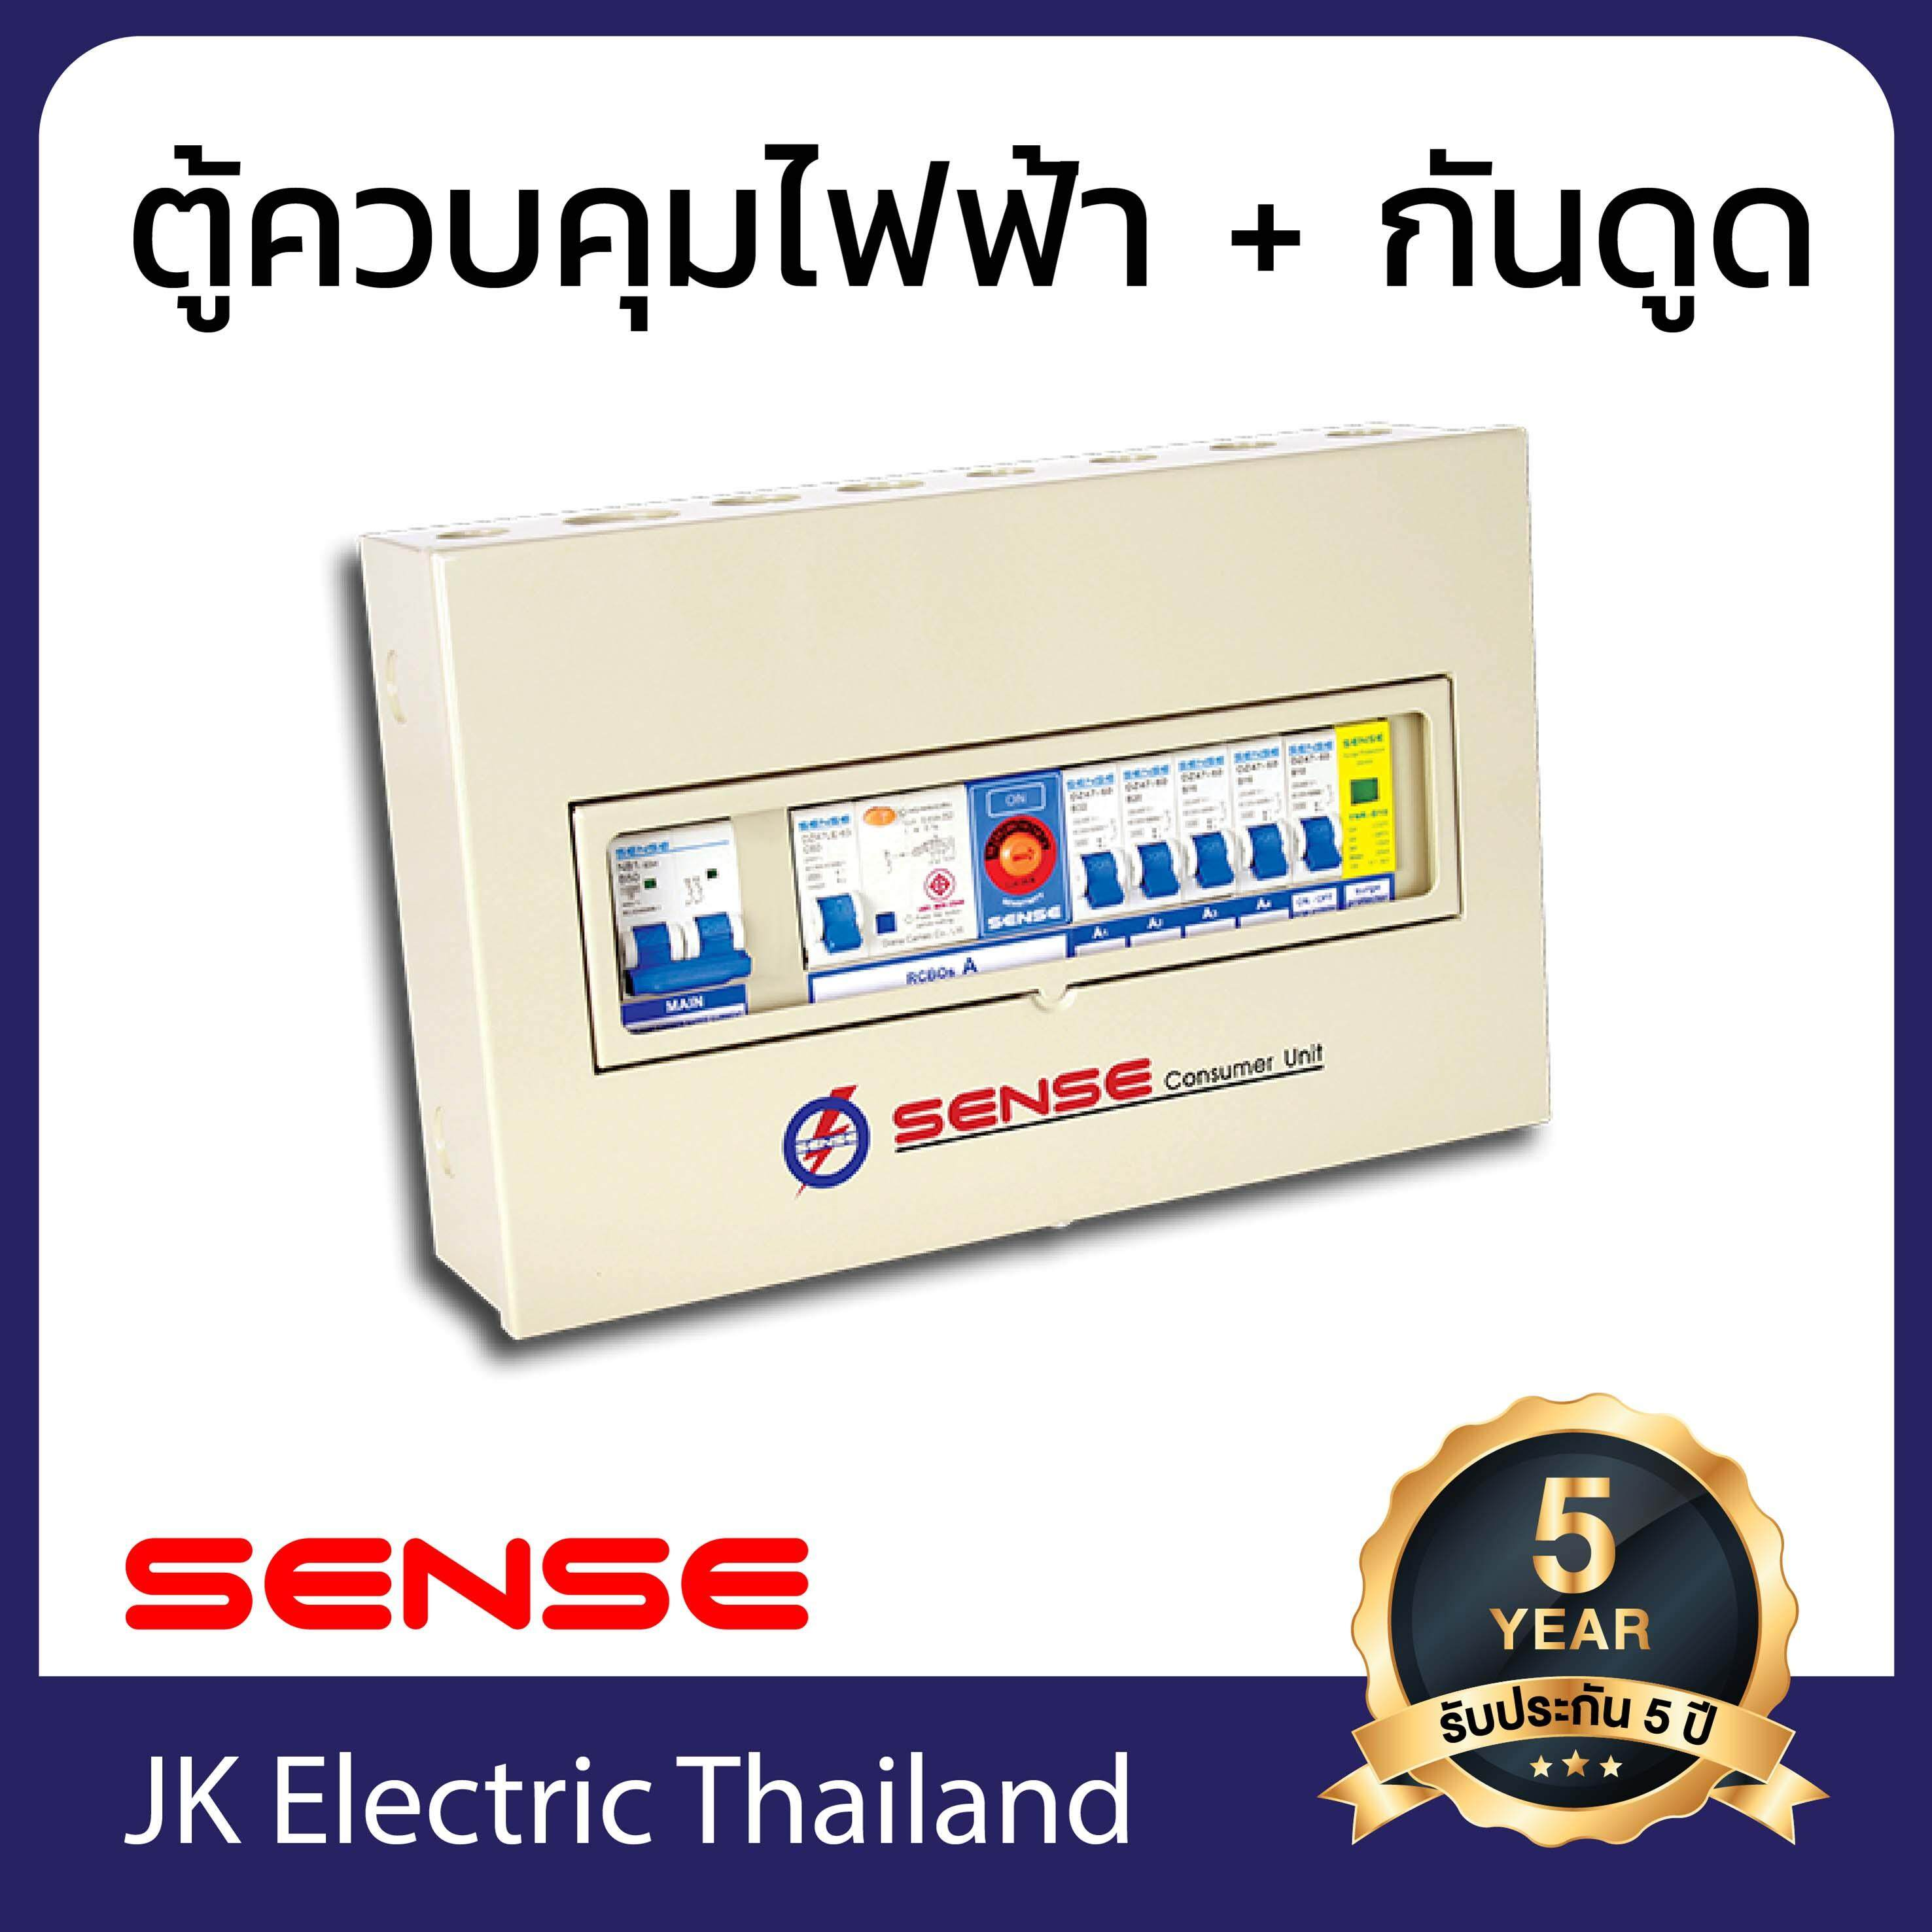 Sense ตู้ไฟ ตู้ควบคุมไฟฟ้า ตู้คอนซูมเมอร์ เซนส์ ชนิดคุมทั้งบ้าน ขนาด 4 ช่อง พร้อม เครื่องตัดไฟรั่ว (rcd) และ อุปกรณ์ป้องกันฟ้าผ่า (spd) รุ่น S4n (เลือกขนาดเมน 32a, 50a, 63a และลูกย่อย 10a, 16a, 20a, 32a ตามต้องการ) ป้องกันไฟดูด ไฟช็อต ไฟรั่ว ใช้ไฟเกิน.